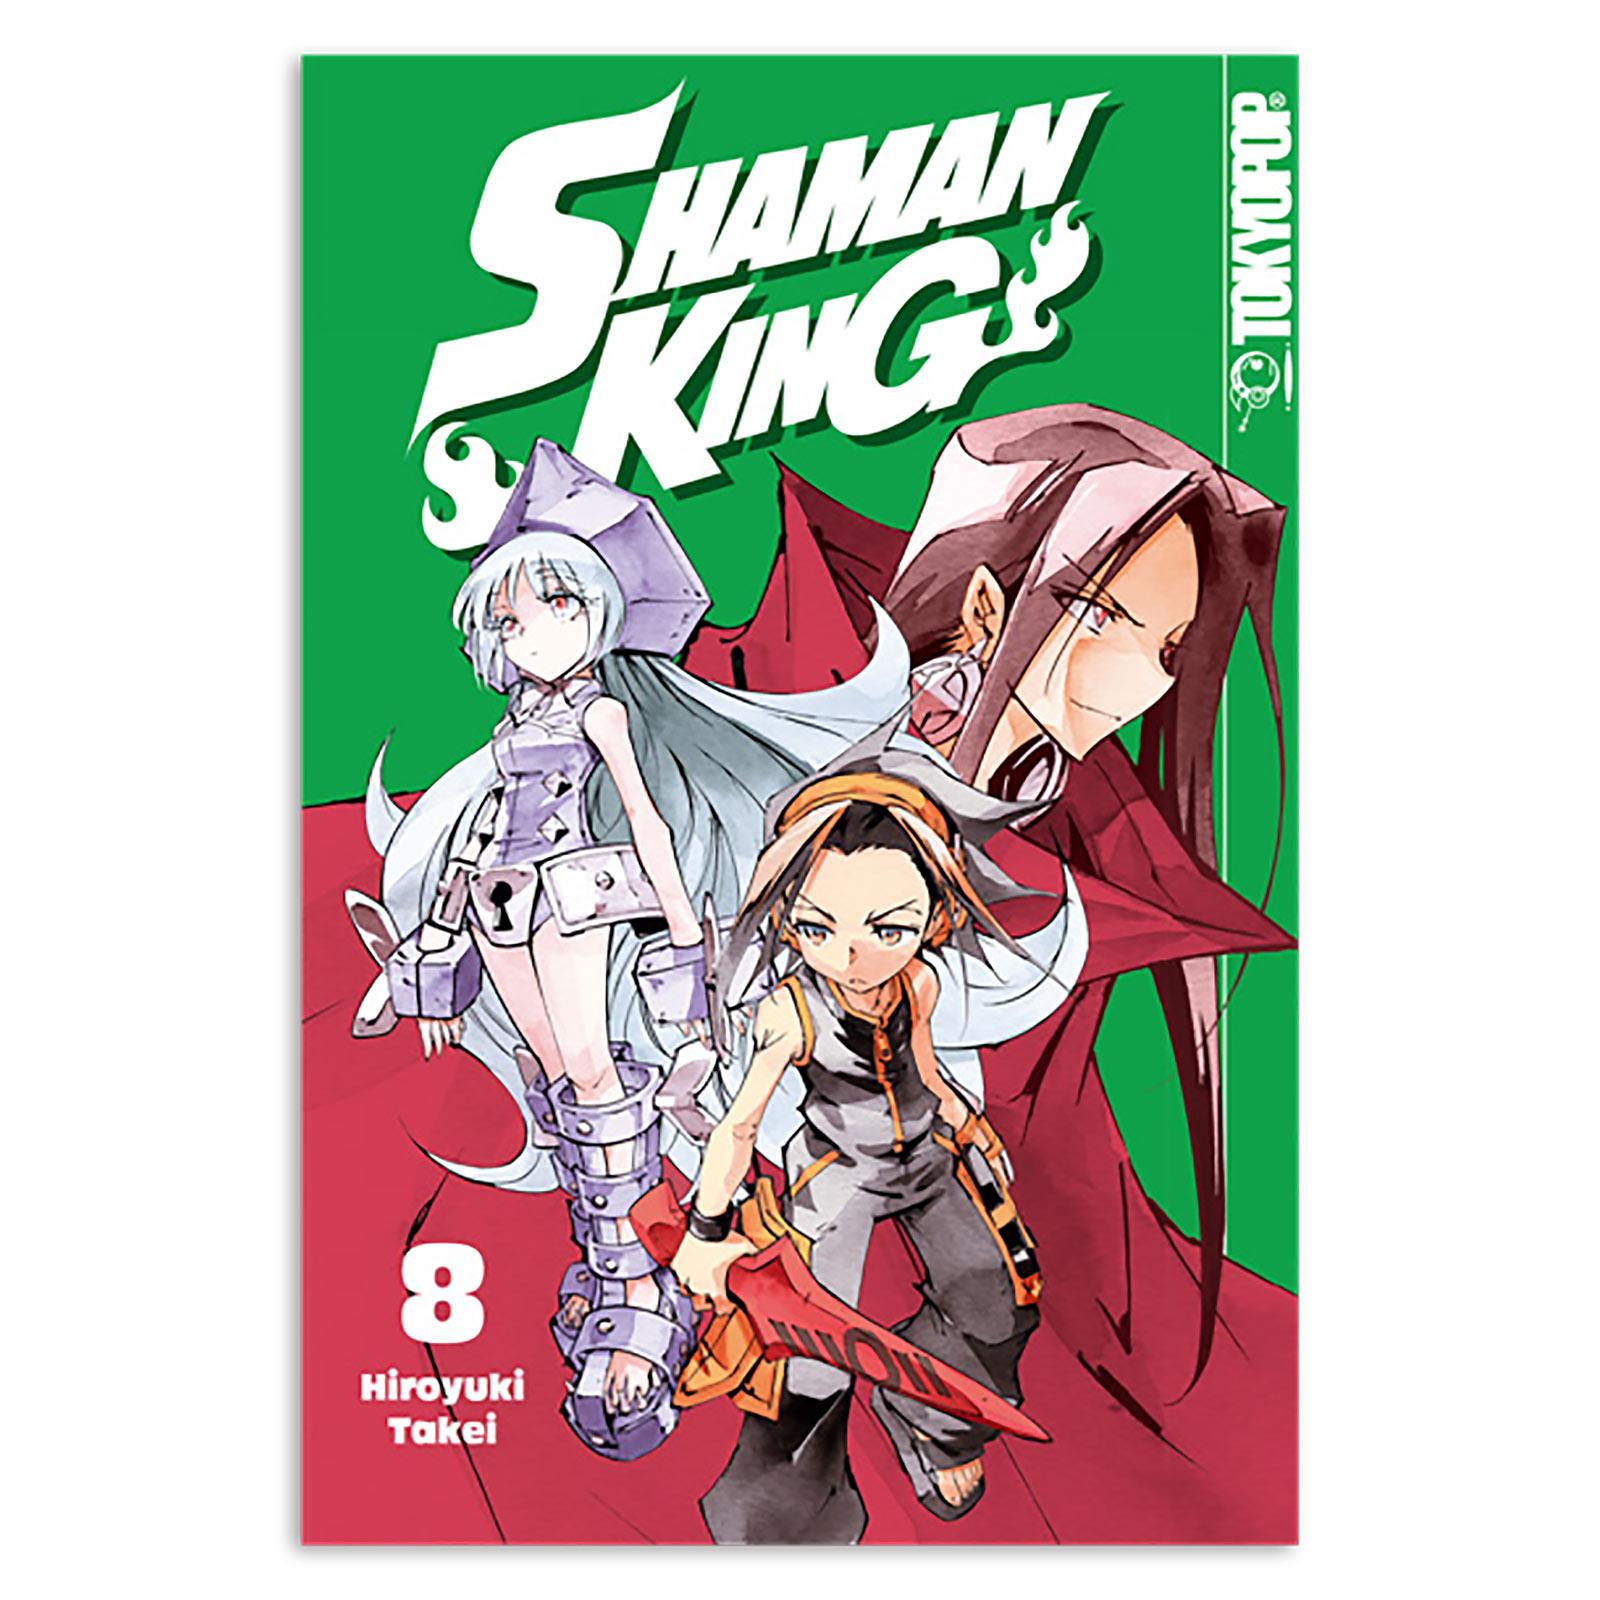 Shaman King - Band 8 Taschenbuch